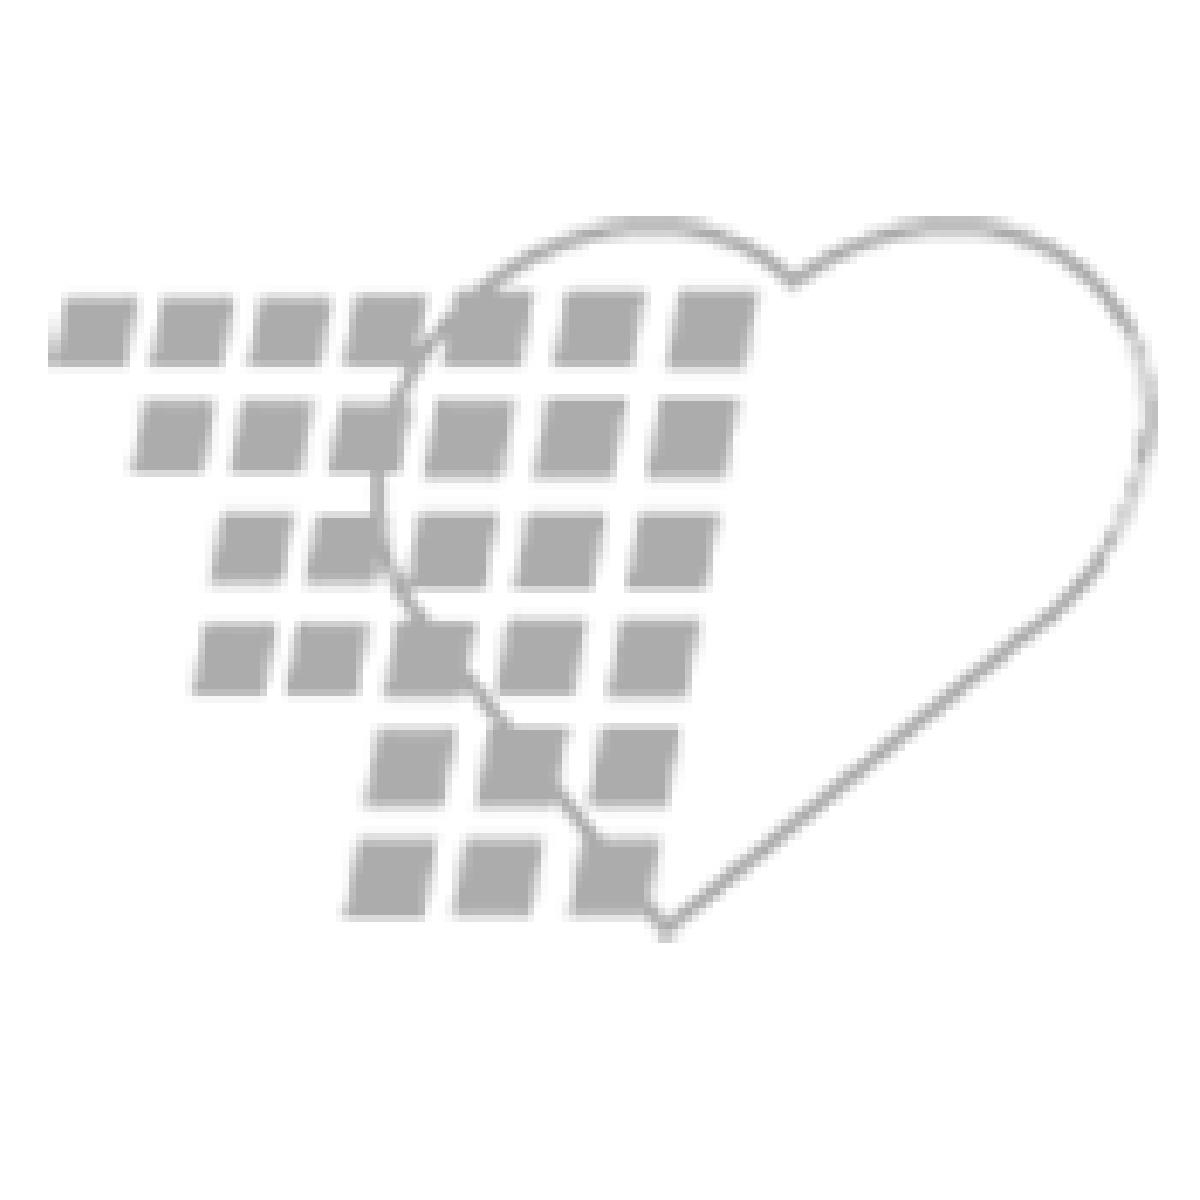 02-70-4070-LGADLT - Satin   MacIntosh Blade #4